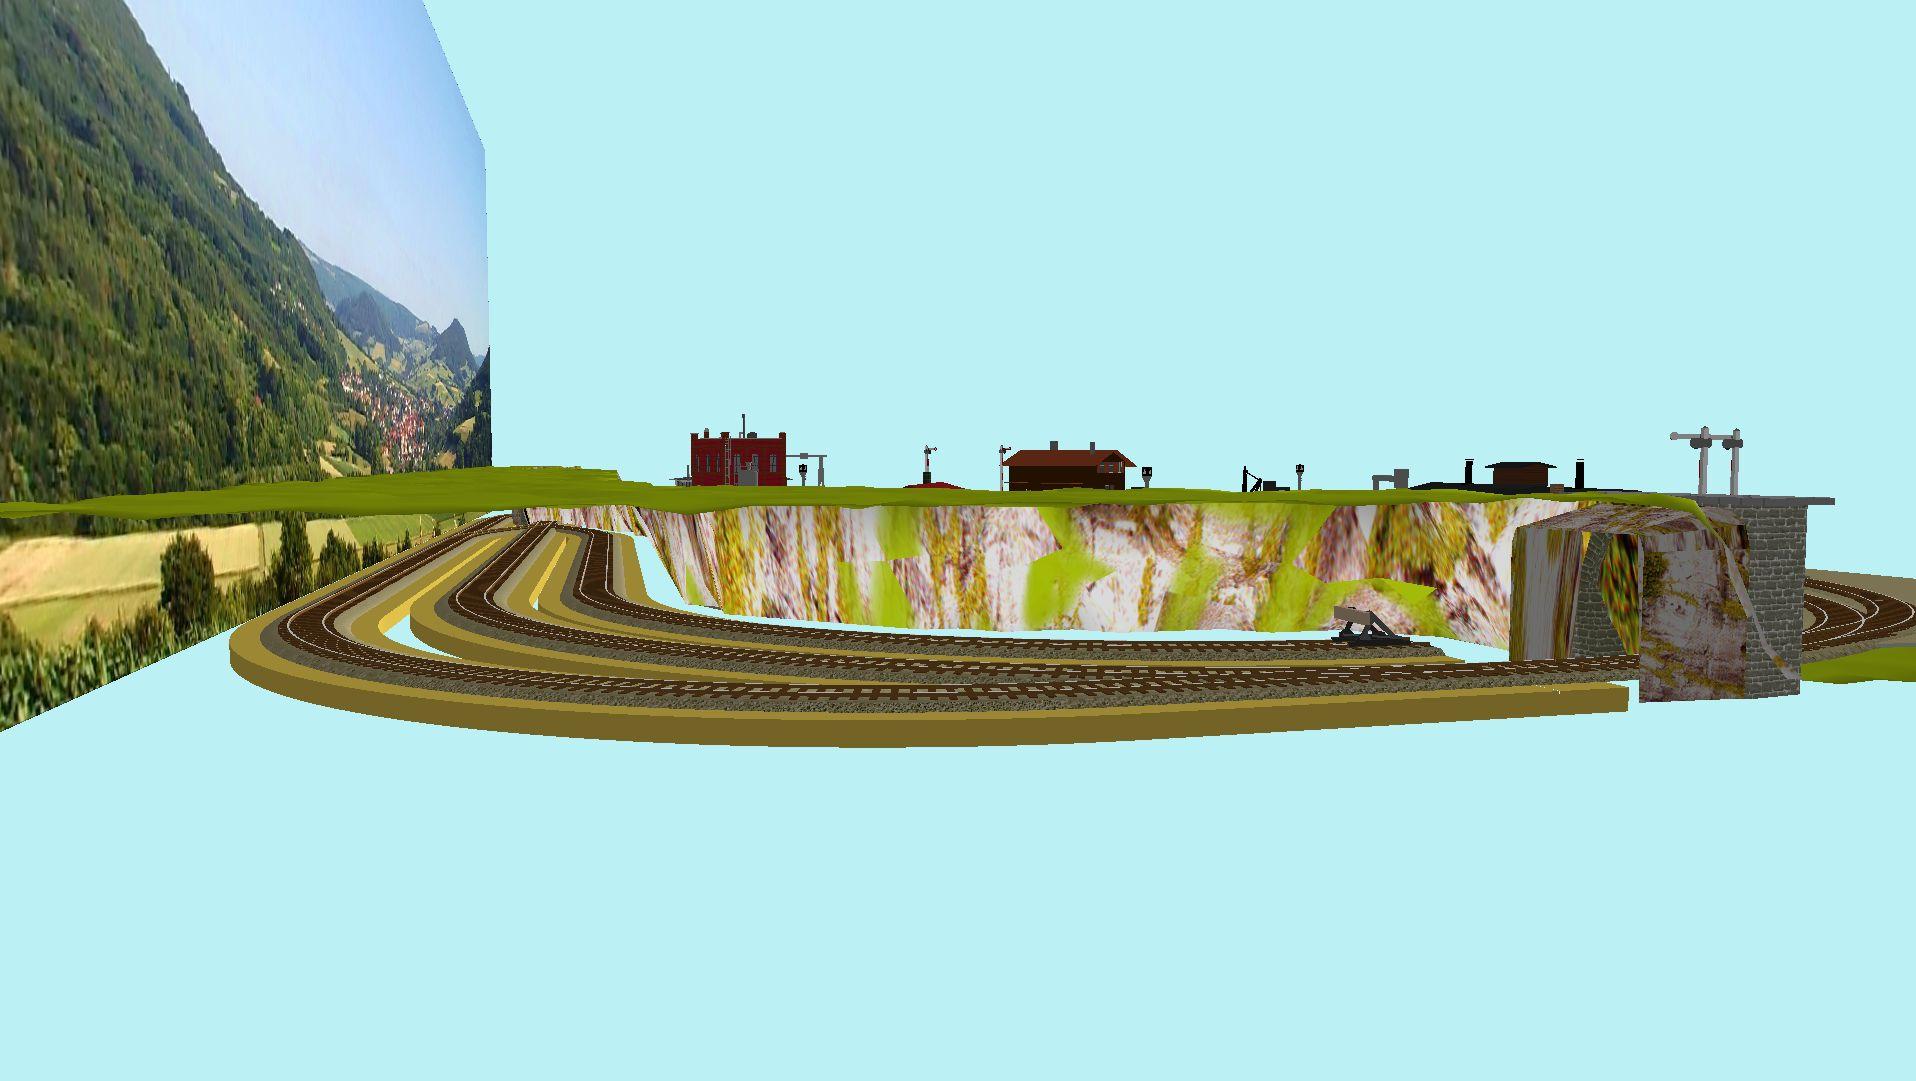 'ALBA Modellbahnpraxis' Band 1, Plan 5 Amp-1_5_m-gleis_sb_0ahj6r